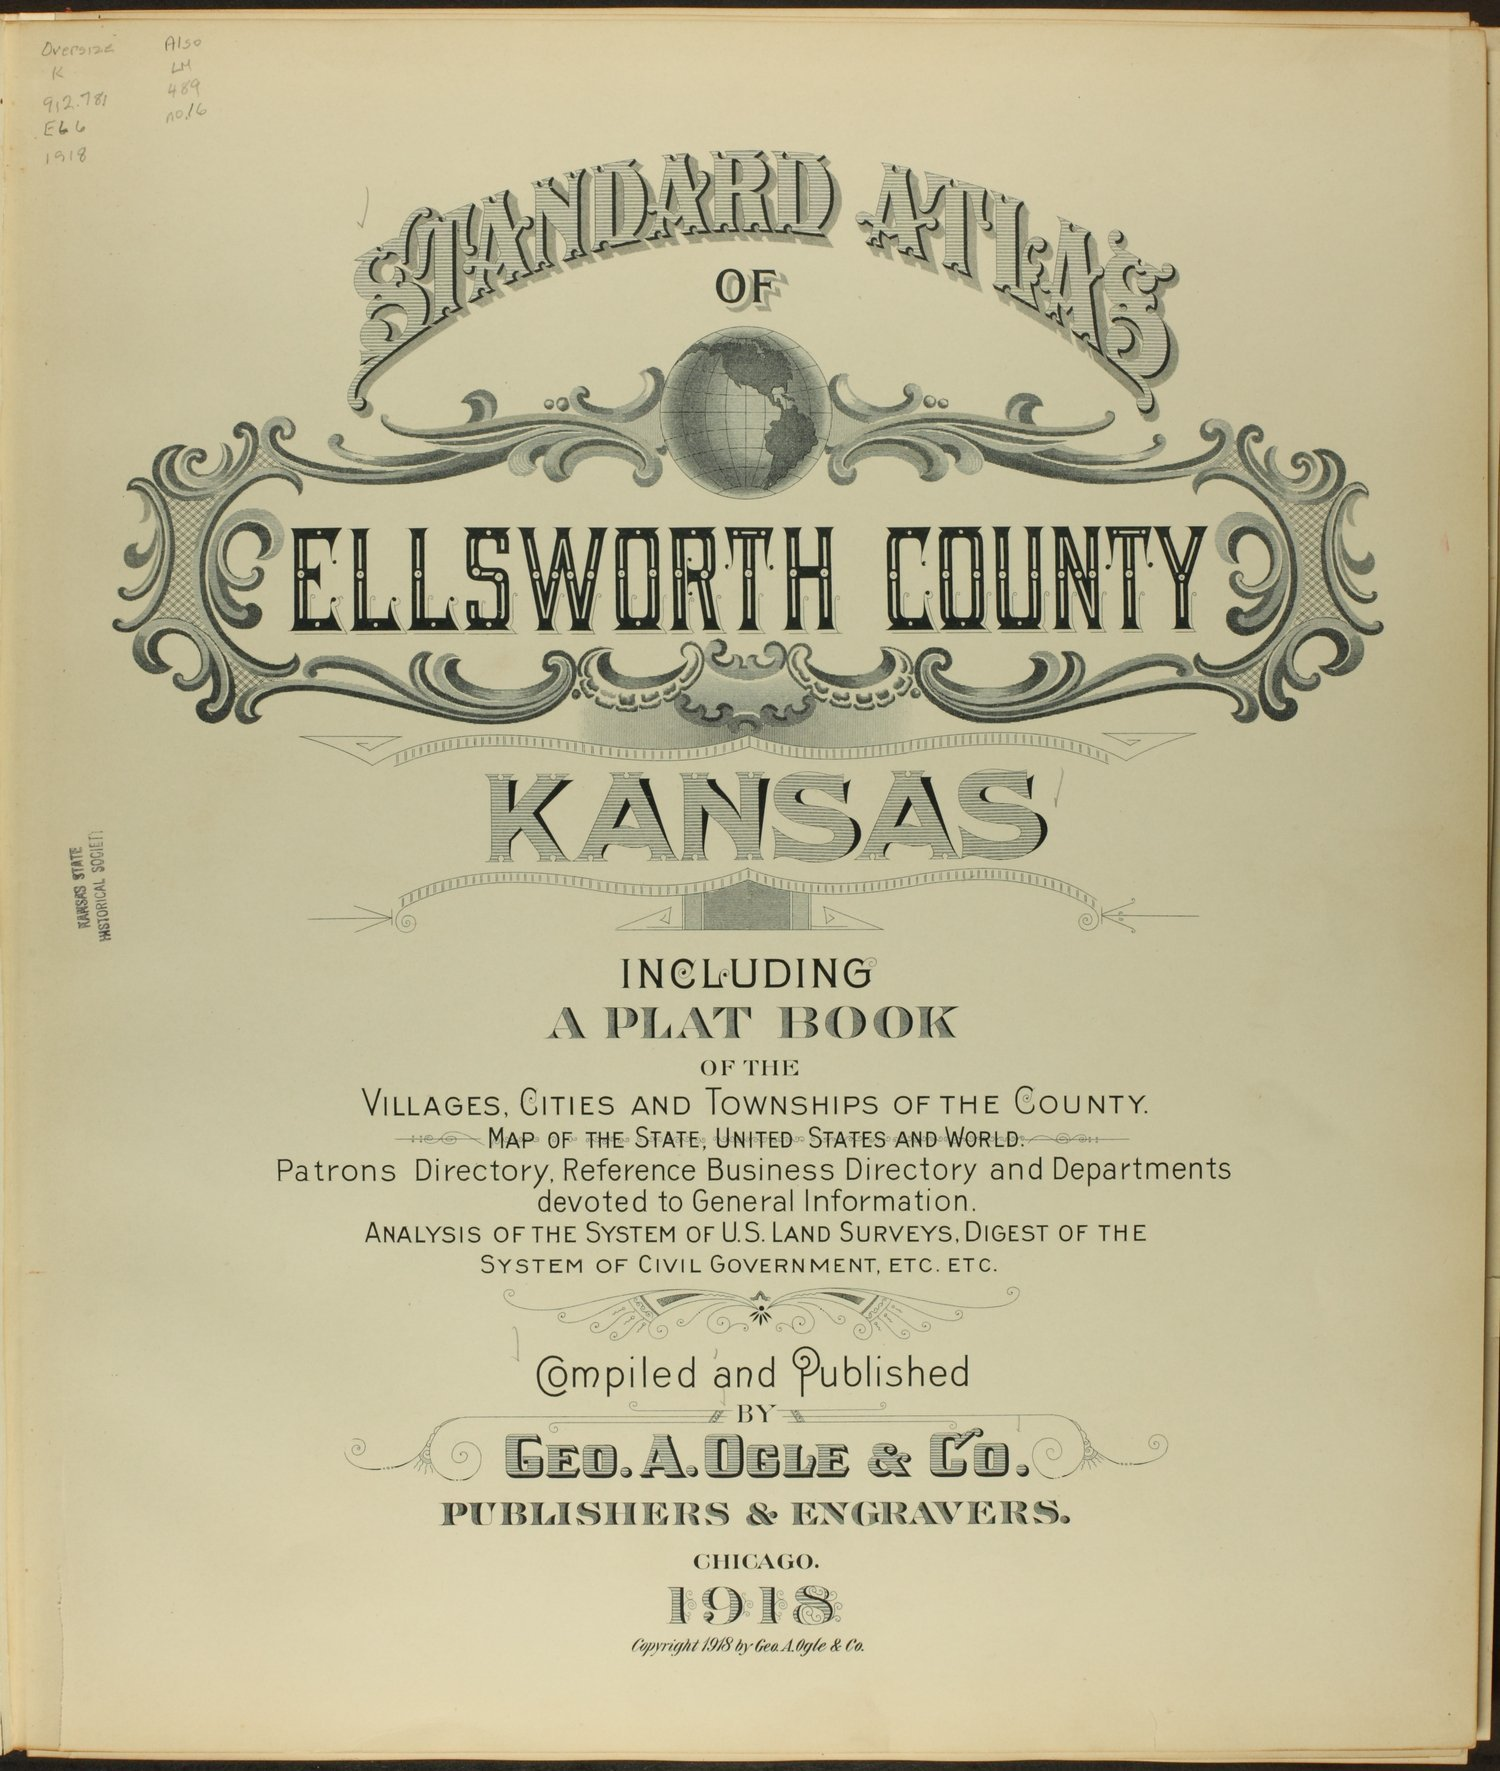 Standard atlas of Ellsworth County, Kansas - Title Page